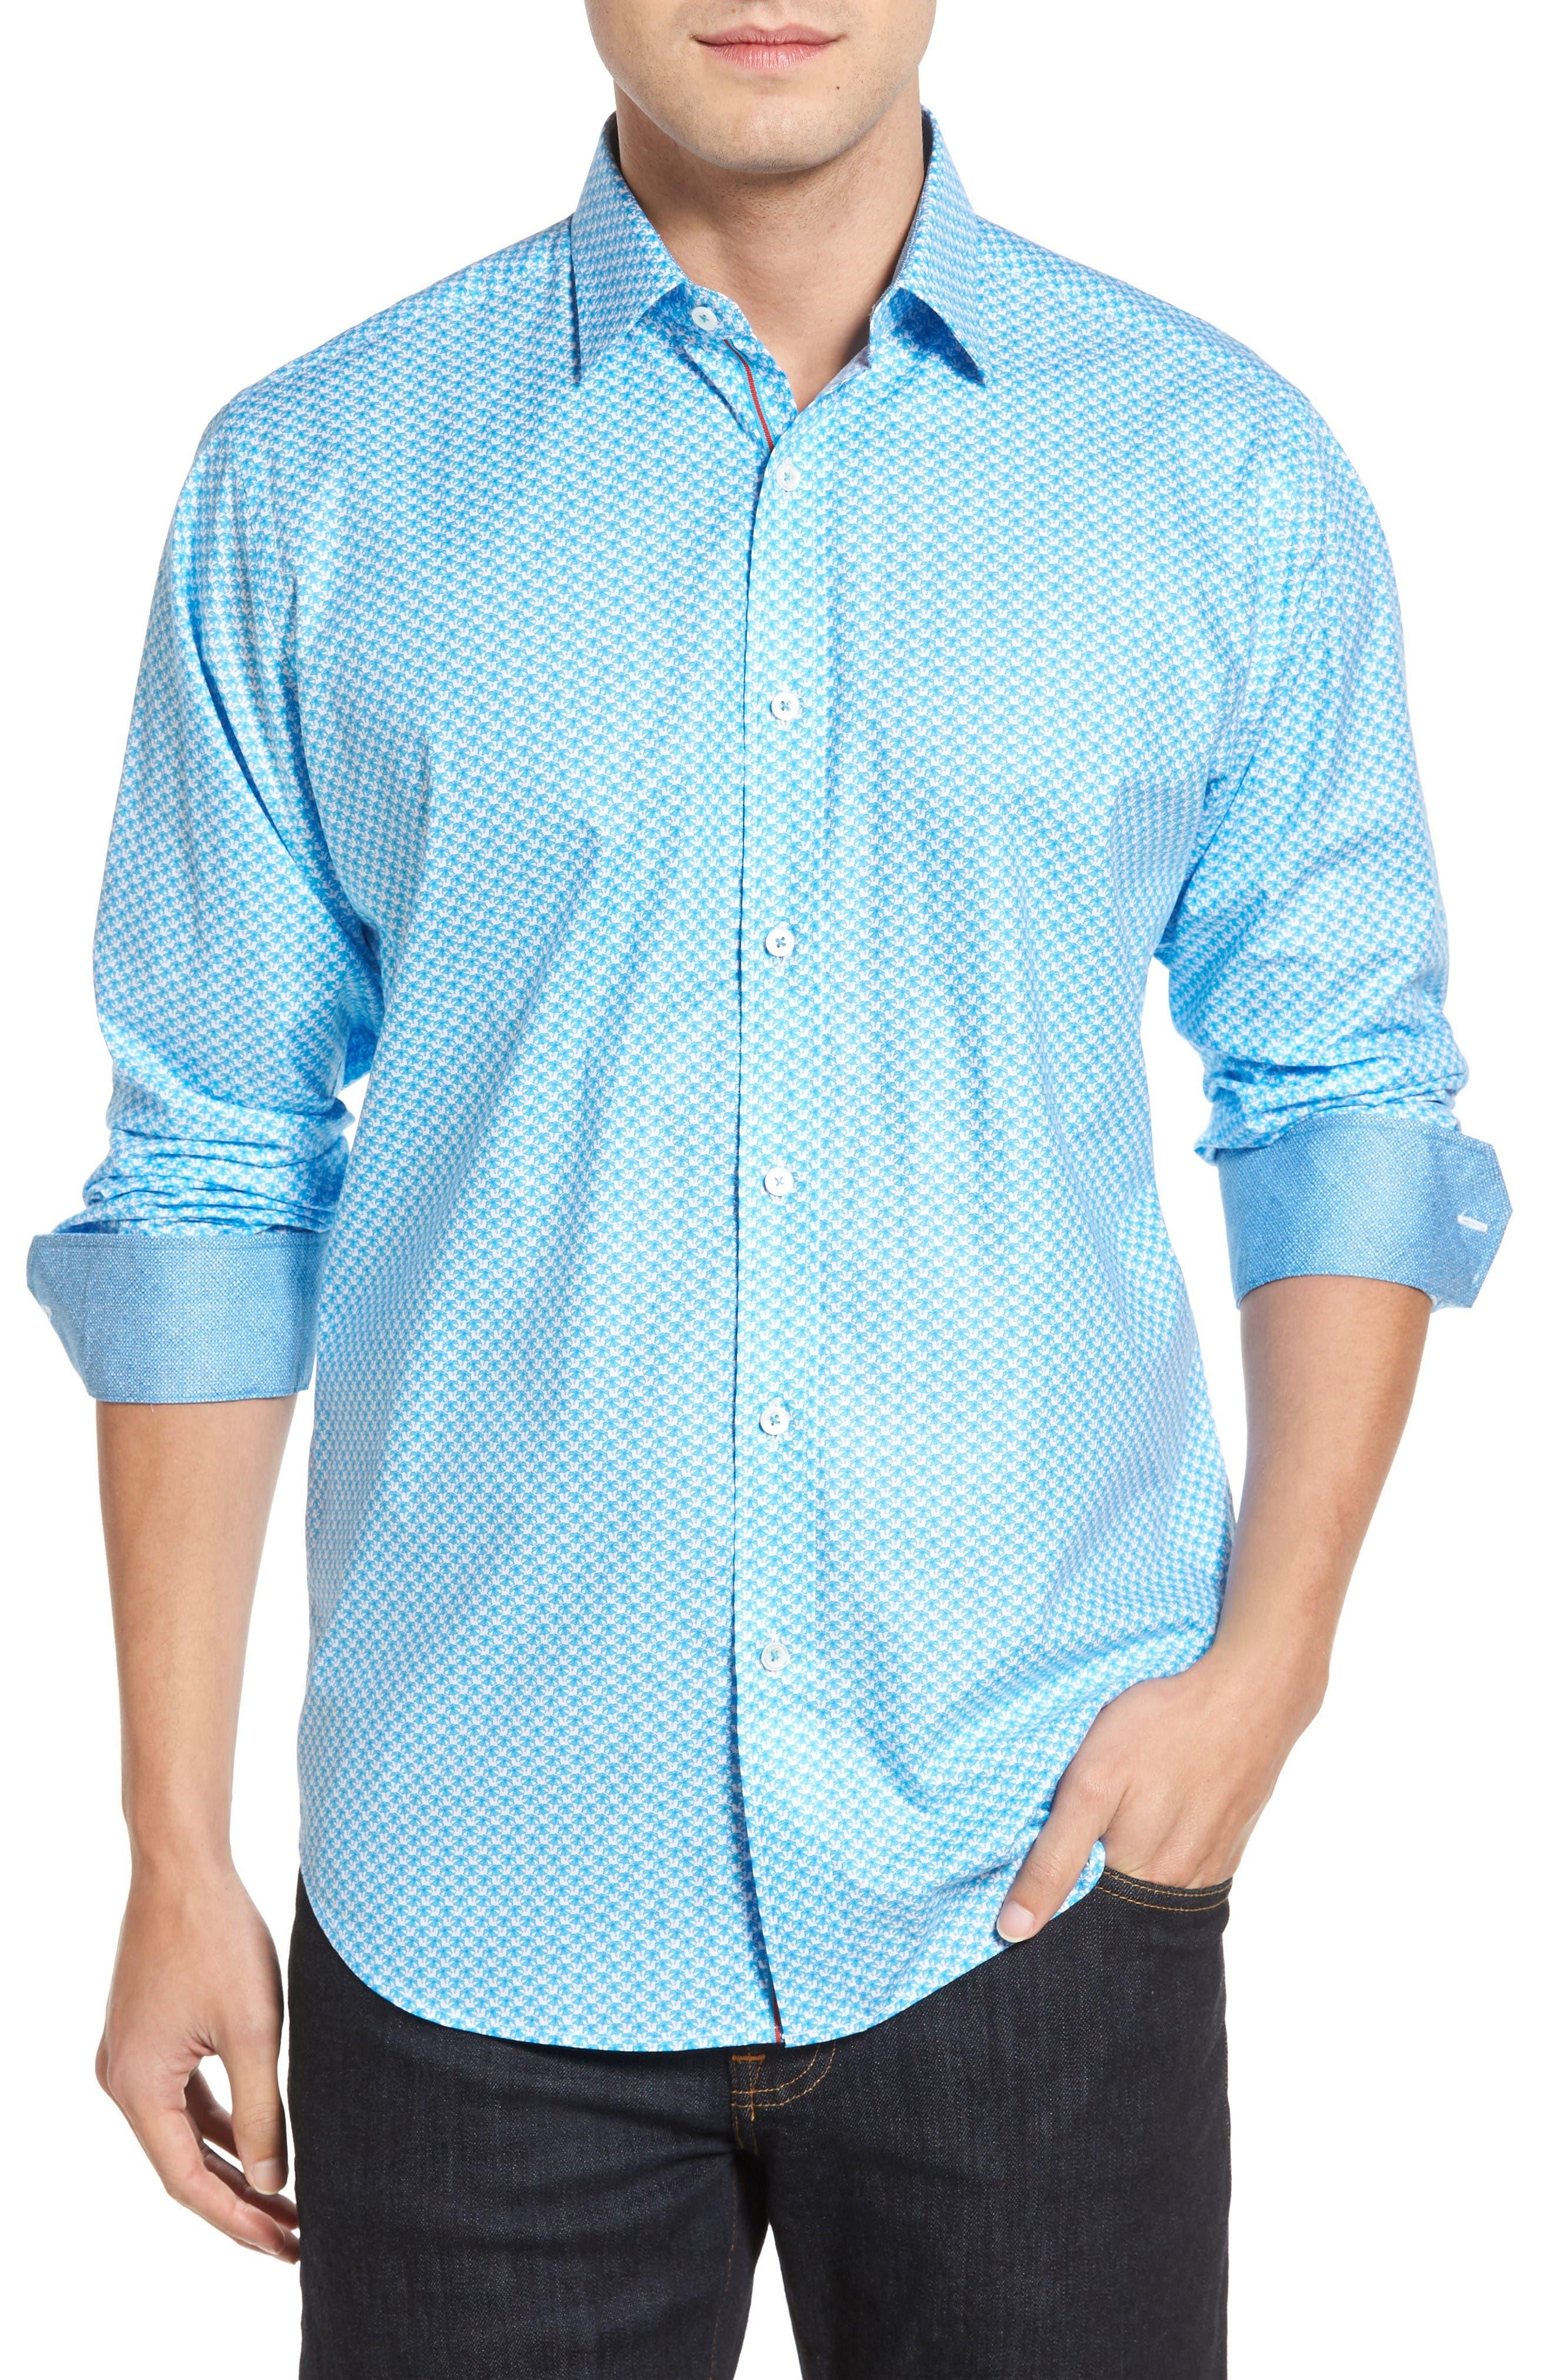 Main Image - Bugatchi Classic Fit Umbrella Print Sport Shirt